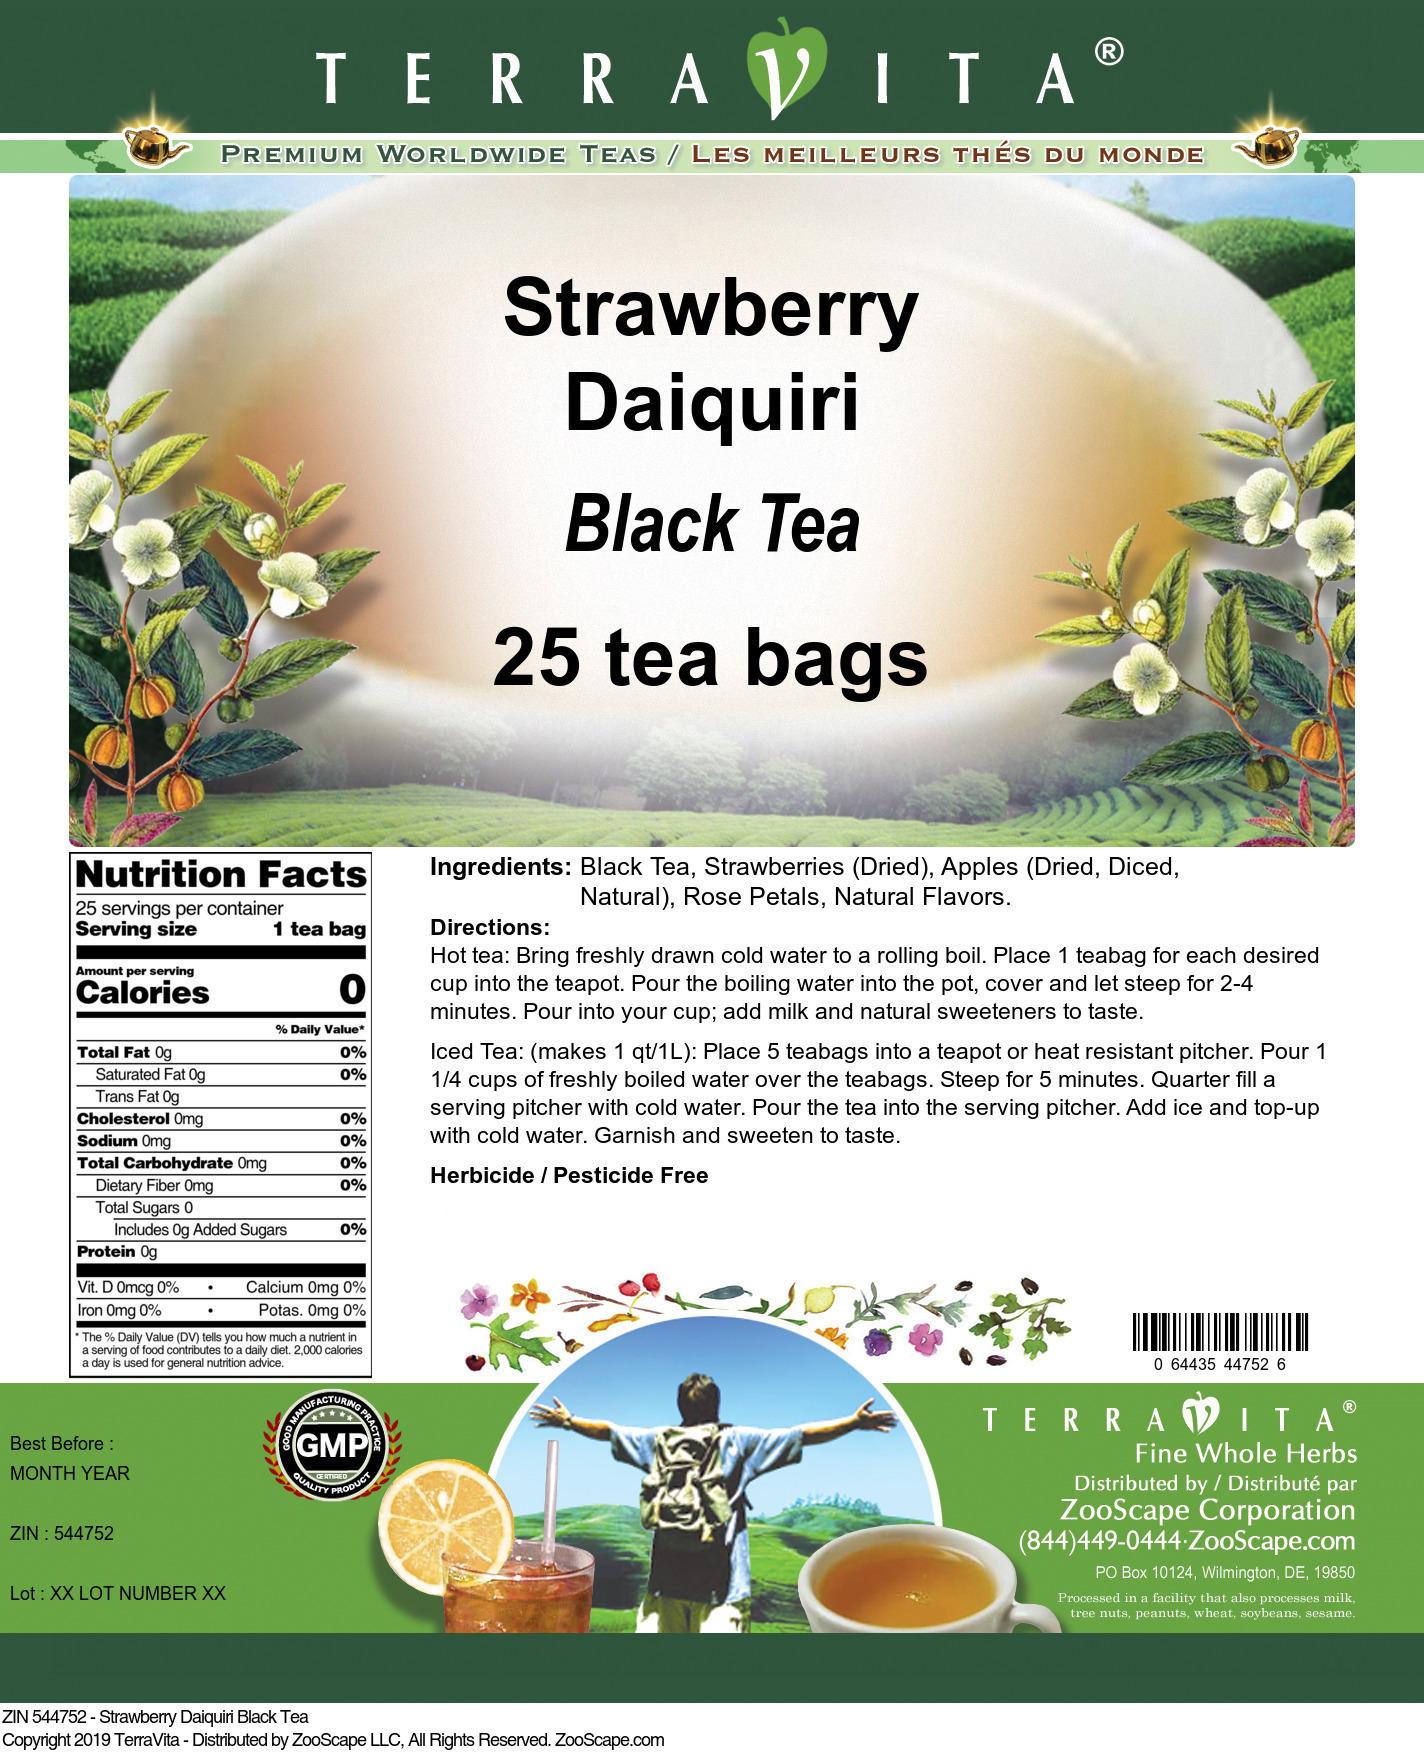 Strawberry Daiquiri Black Tea